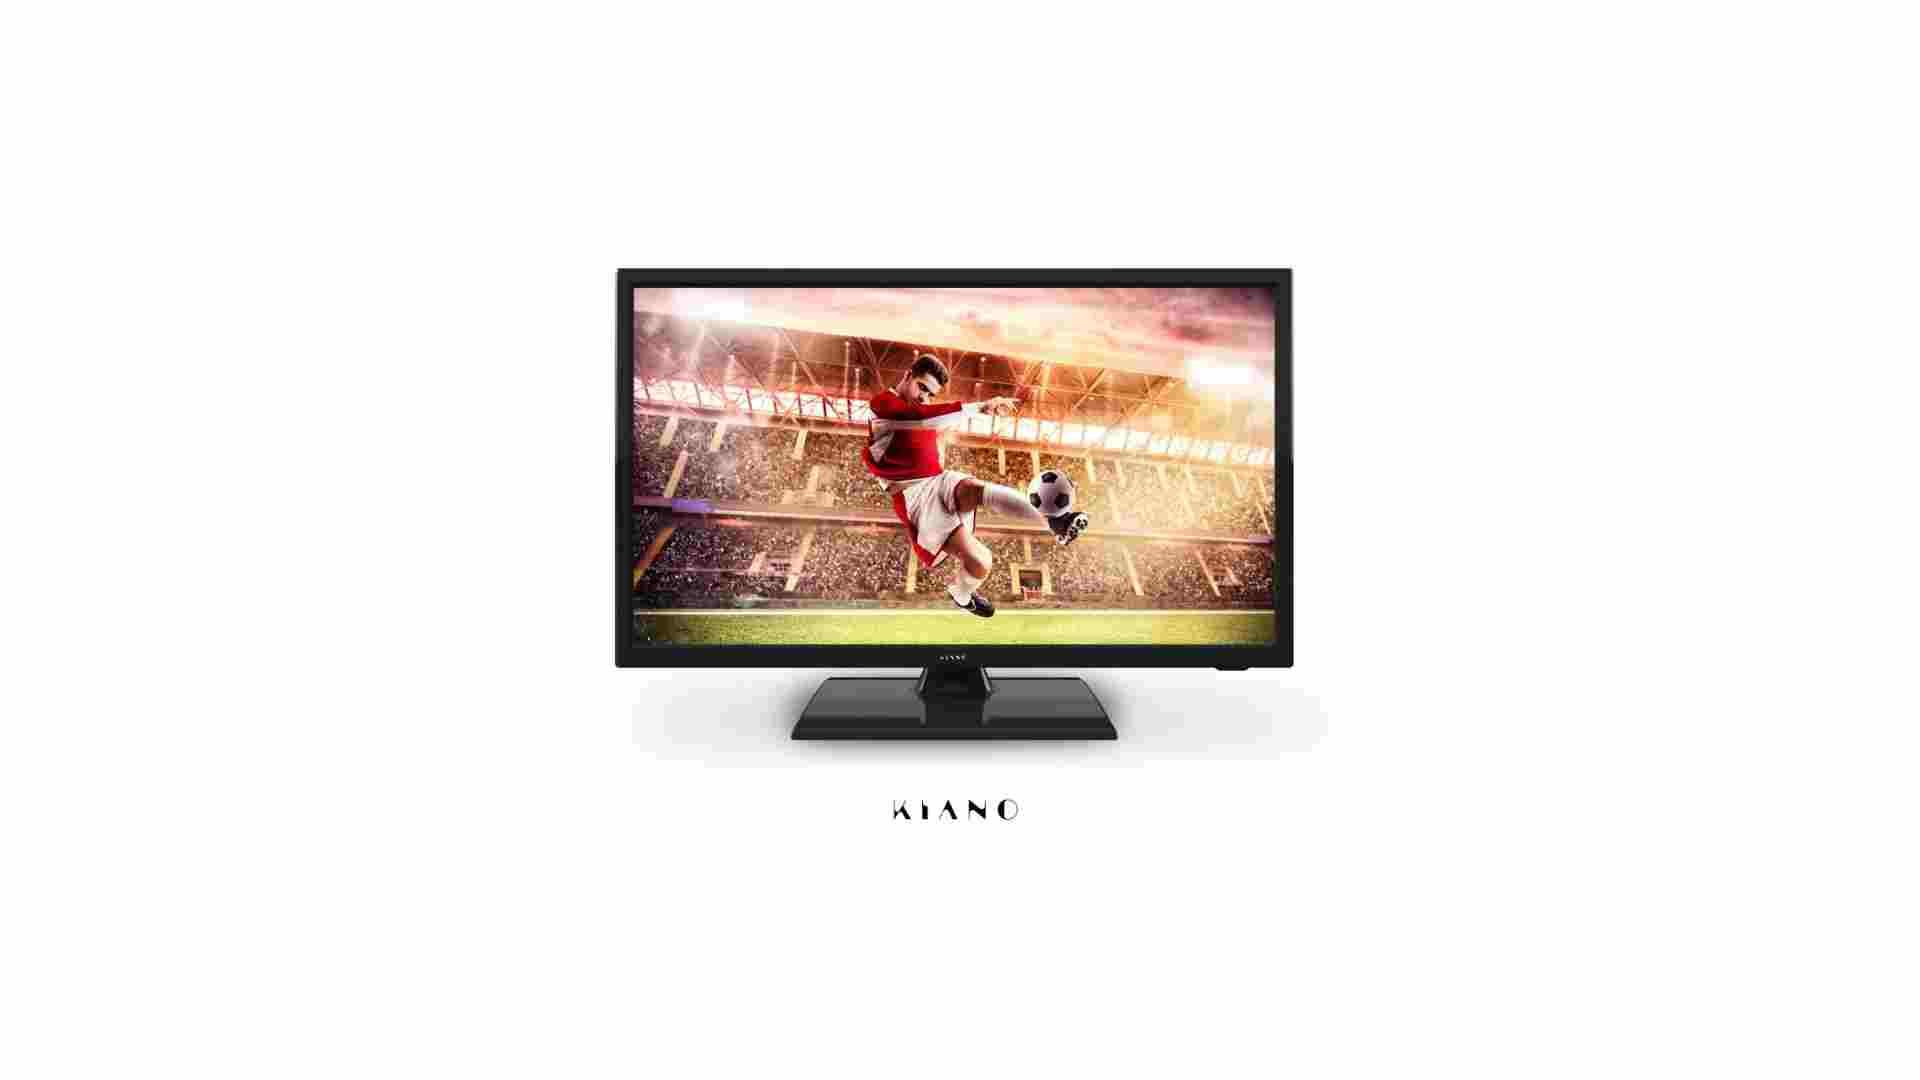 KIANO SLIM TV LED 19